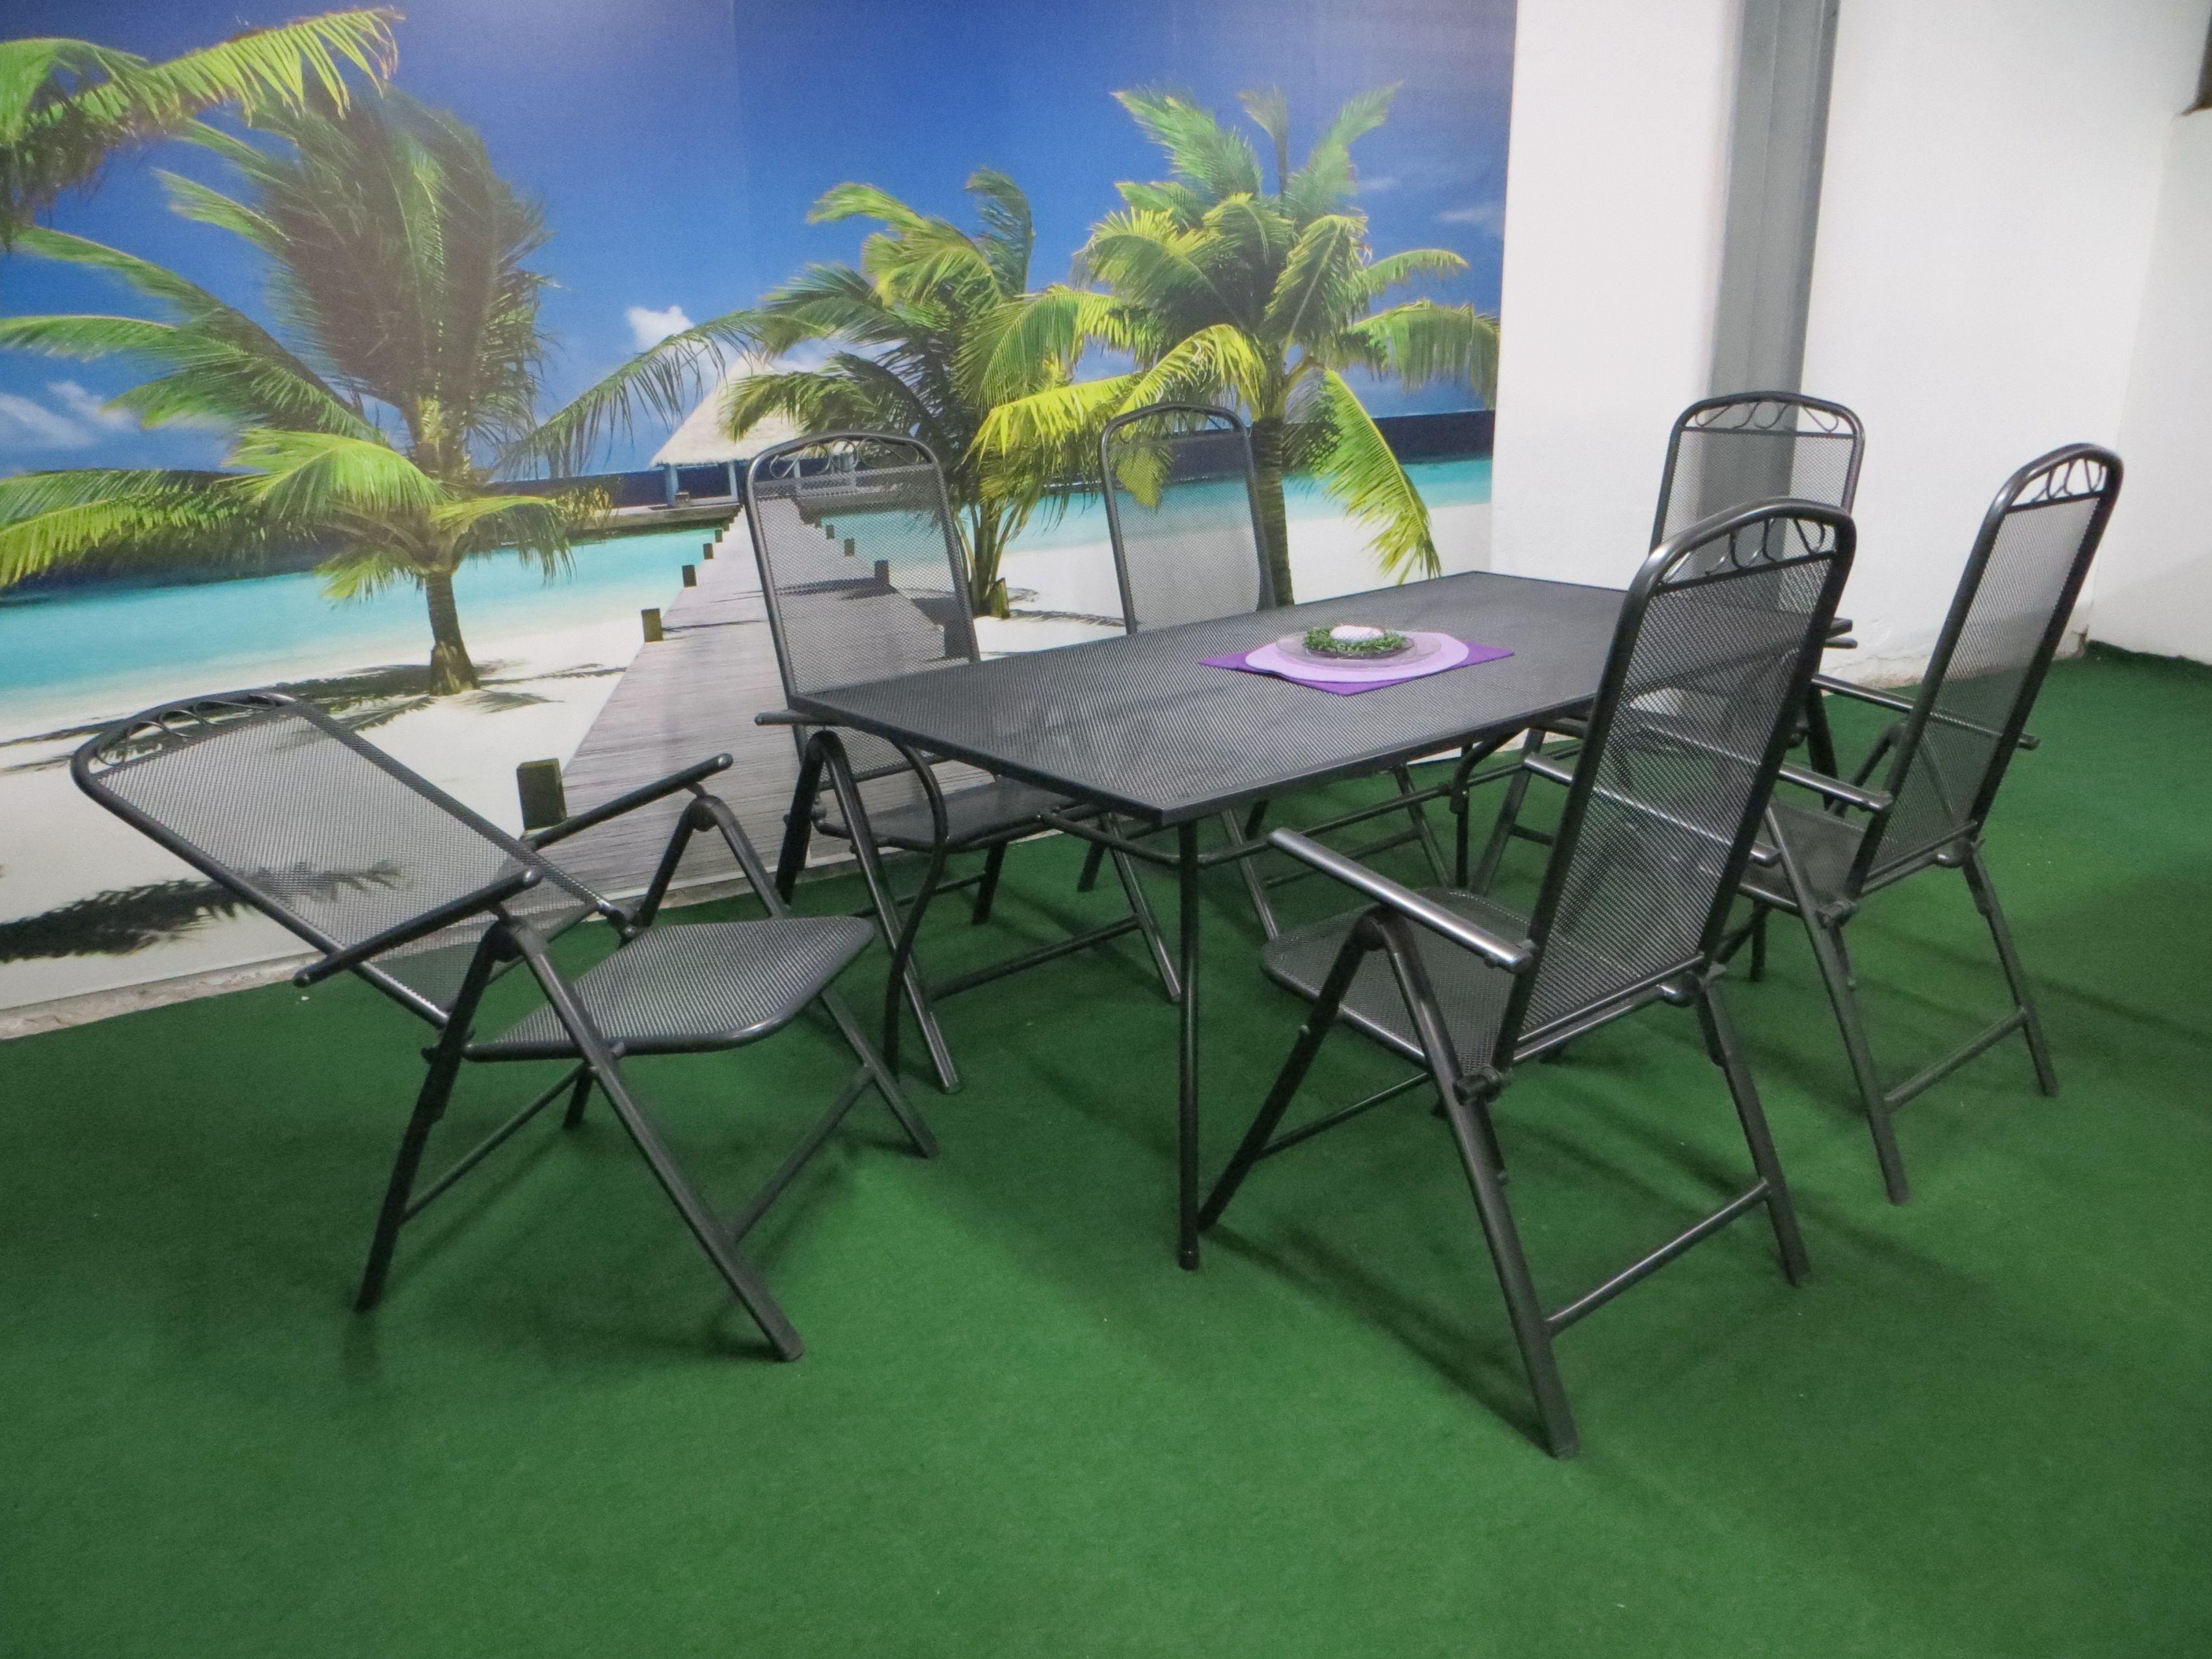 p24 streckmetall gartenm bel set 180x90cm 7 teilig grau. Black Bedroom Furniture Sets. Home Design Ideas